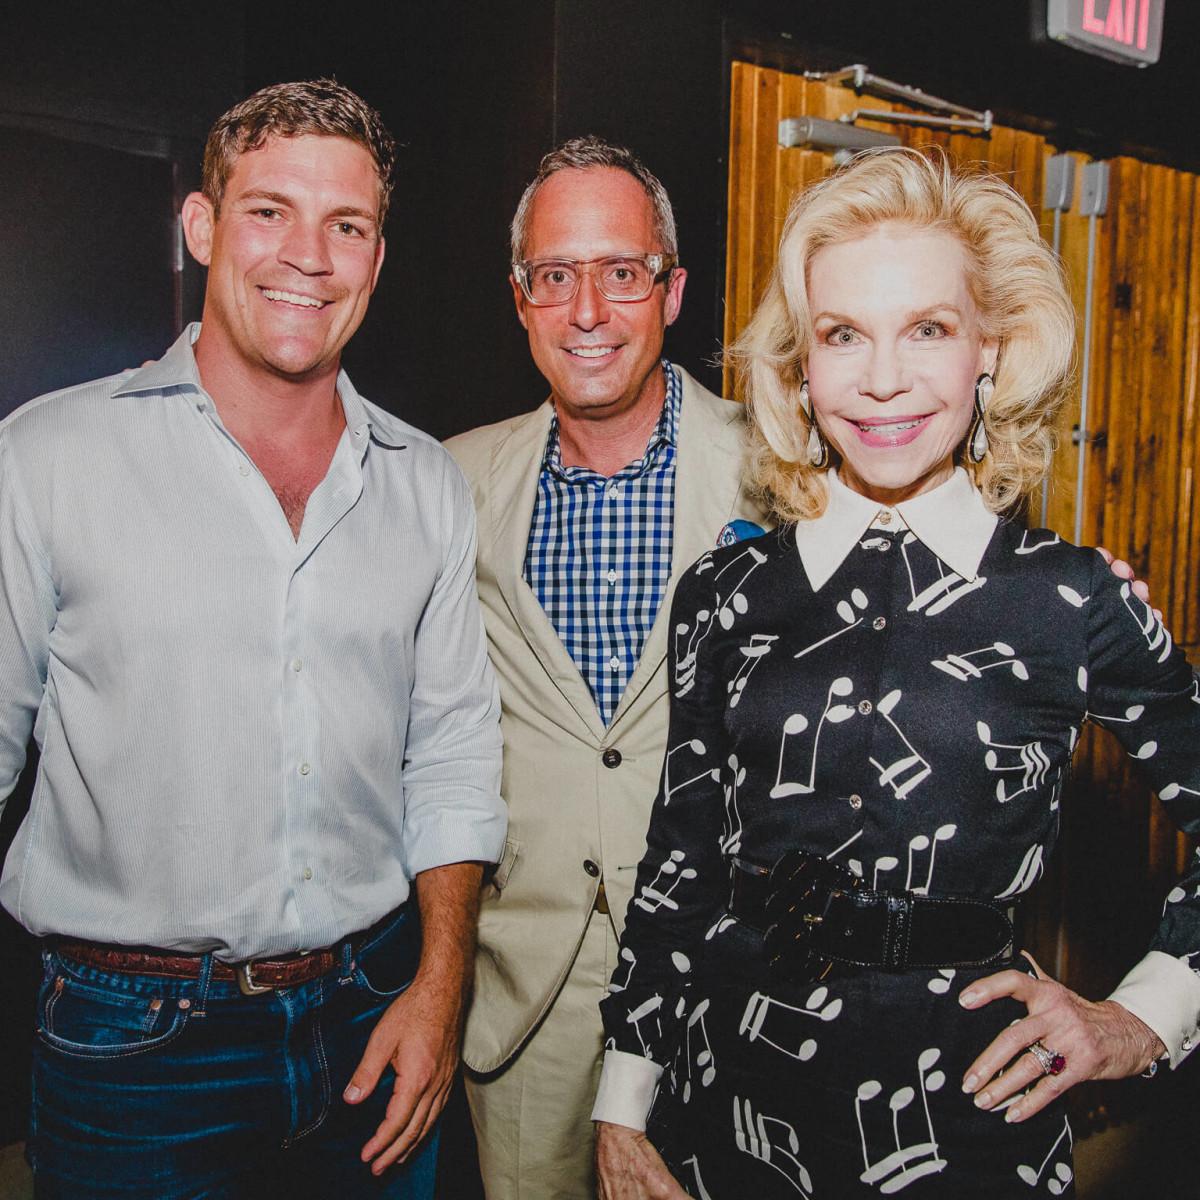 White Oak Music Hall Opening, 8/16, Will Garwood, Mark Sullivan, Lynn Wyatt